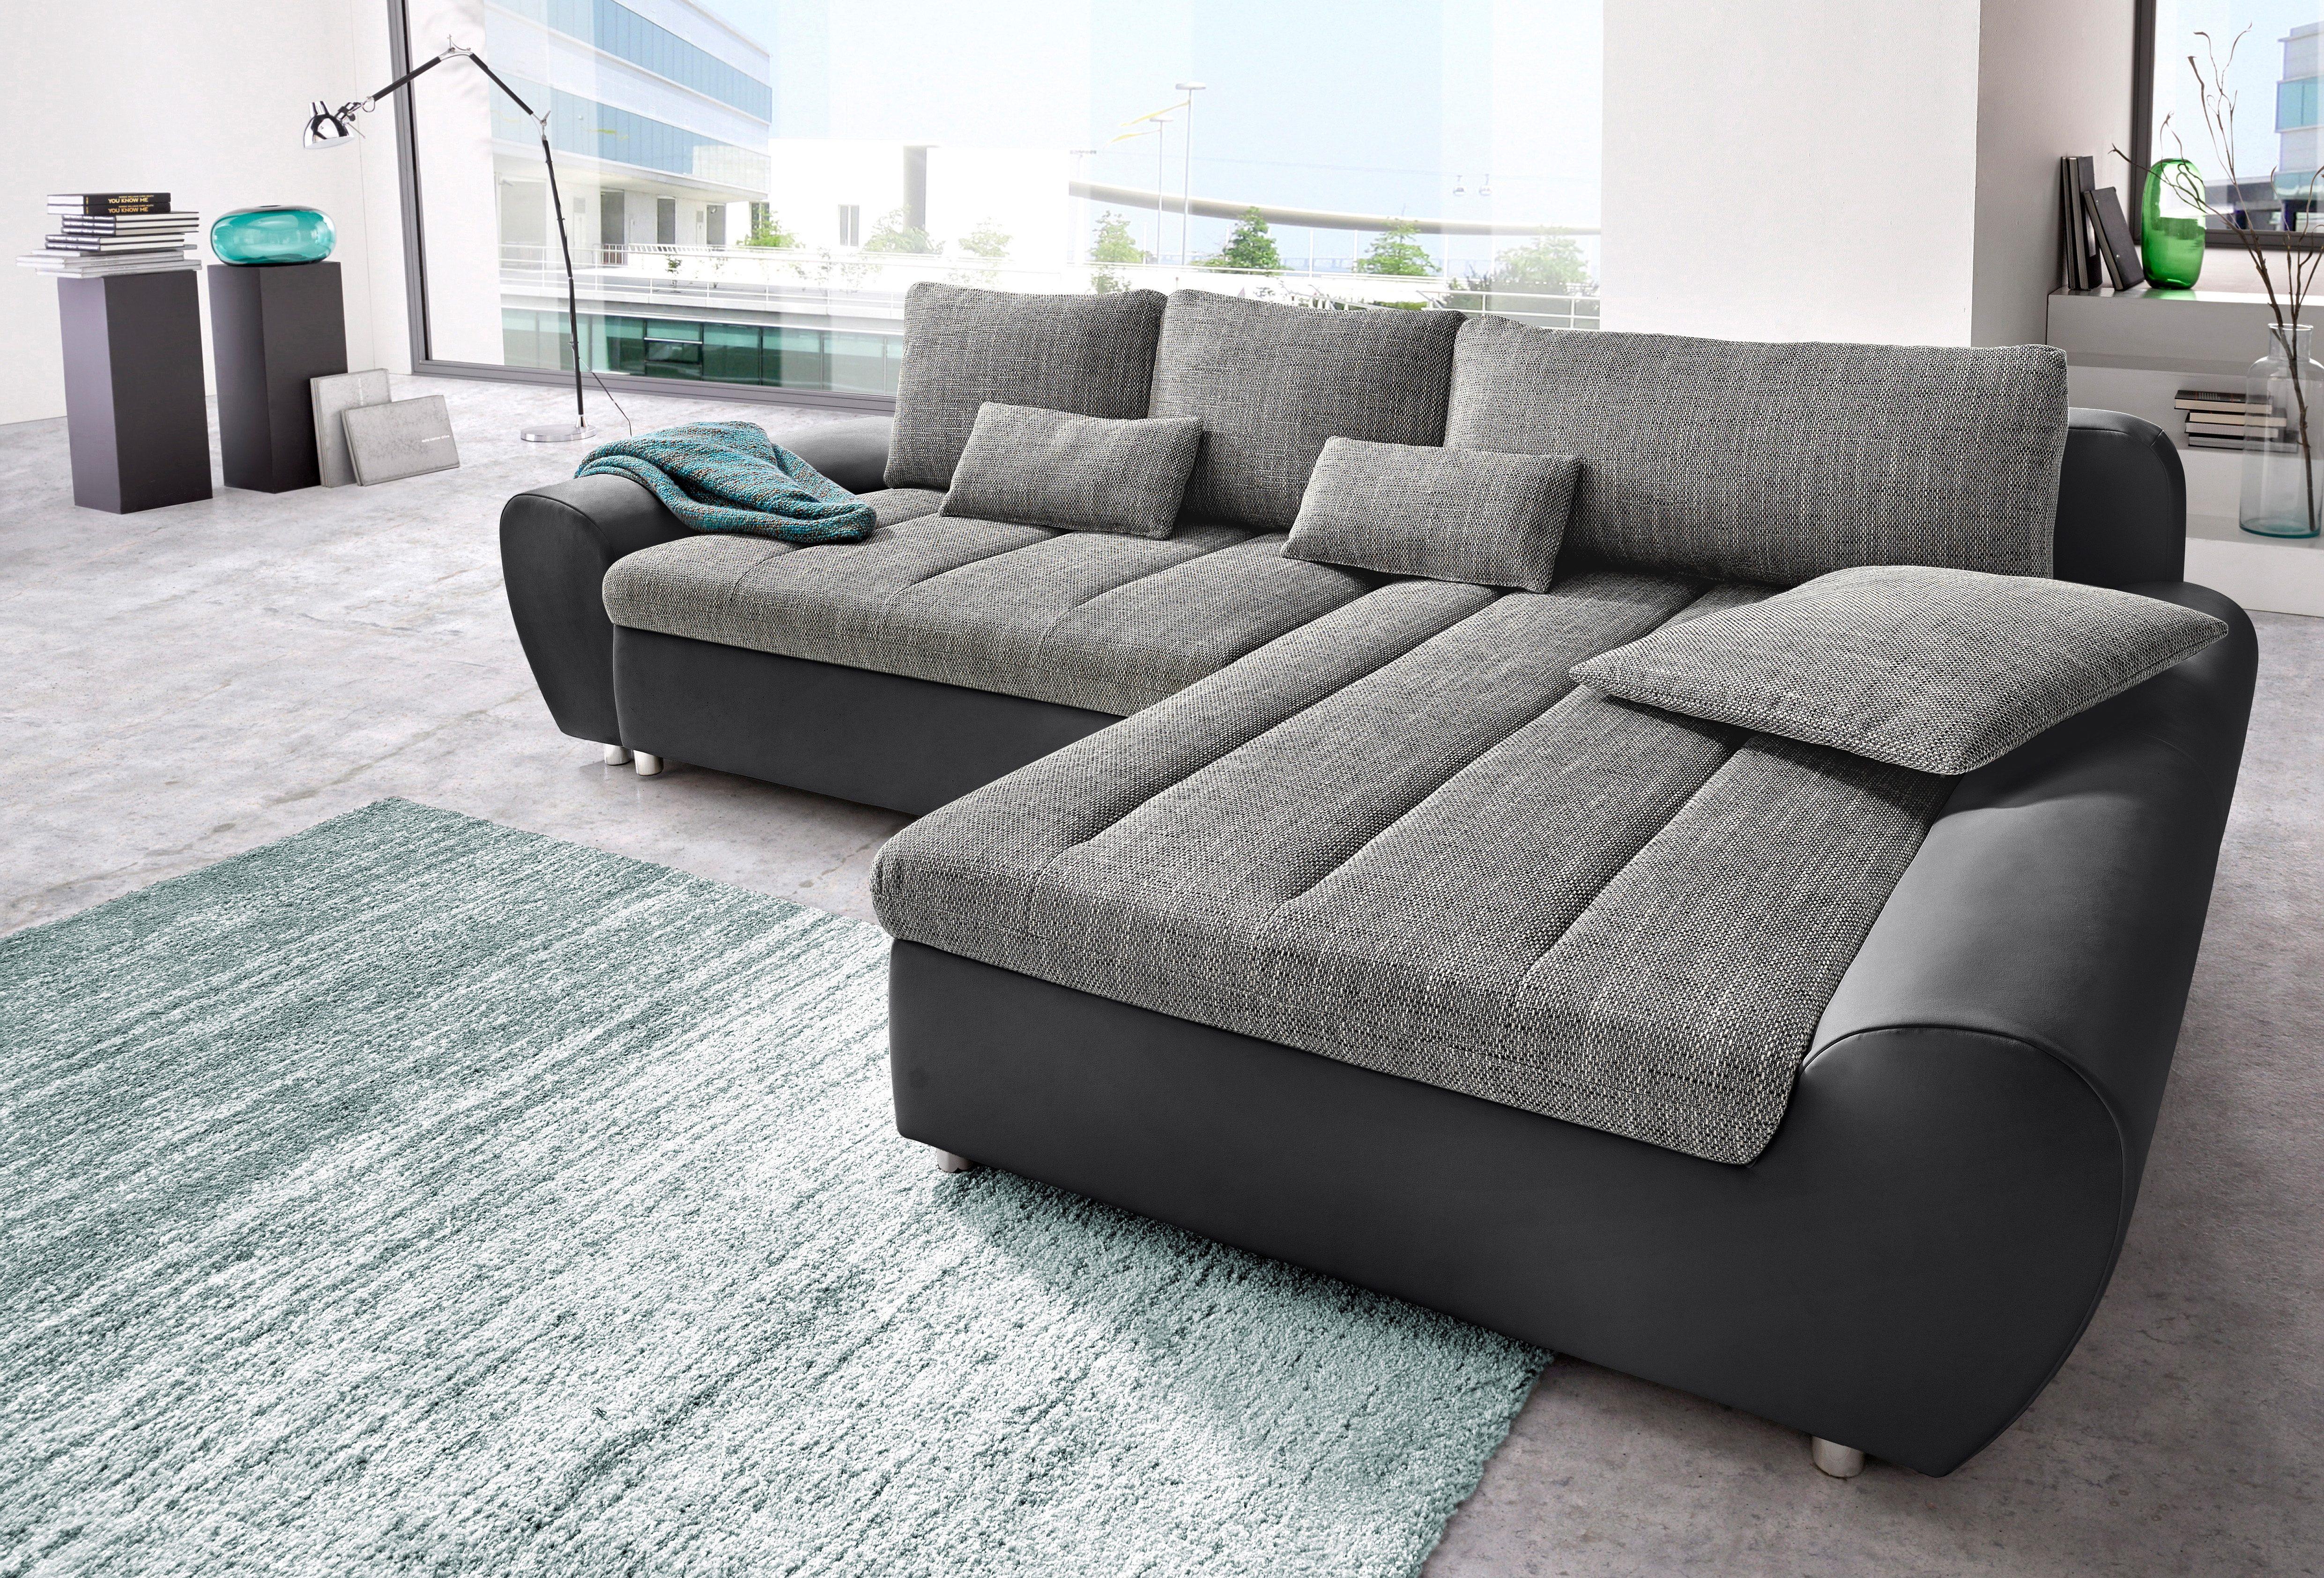 sit&more Ecksofa »Bandos« | Wohnzimmer > Sofas & Couches > Ecksofas & Eckcouches | Grau | sit&more